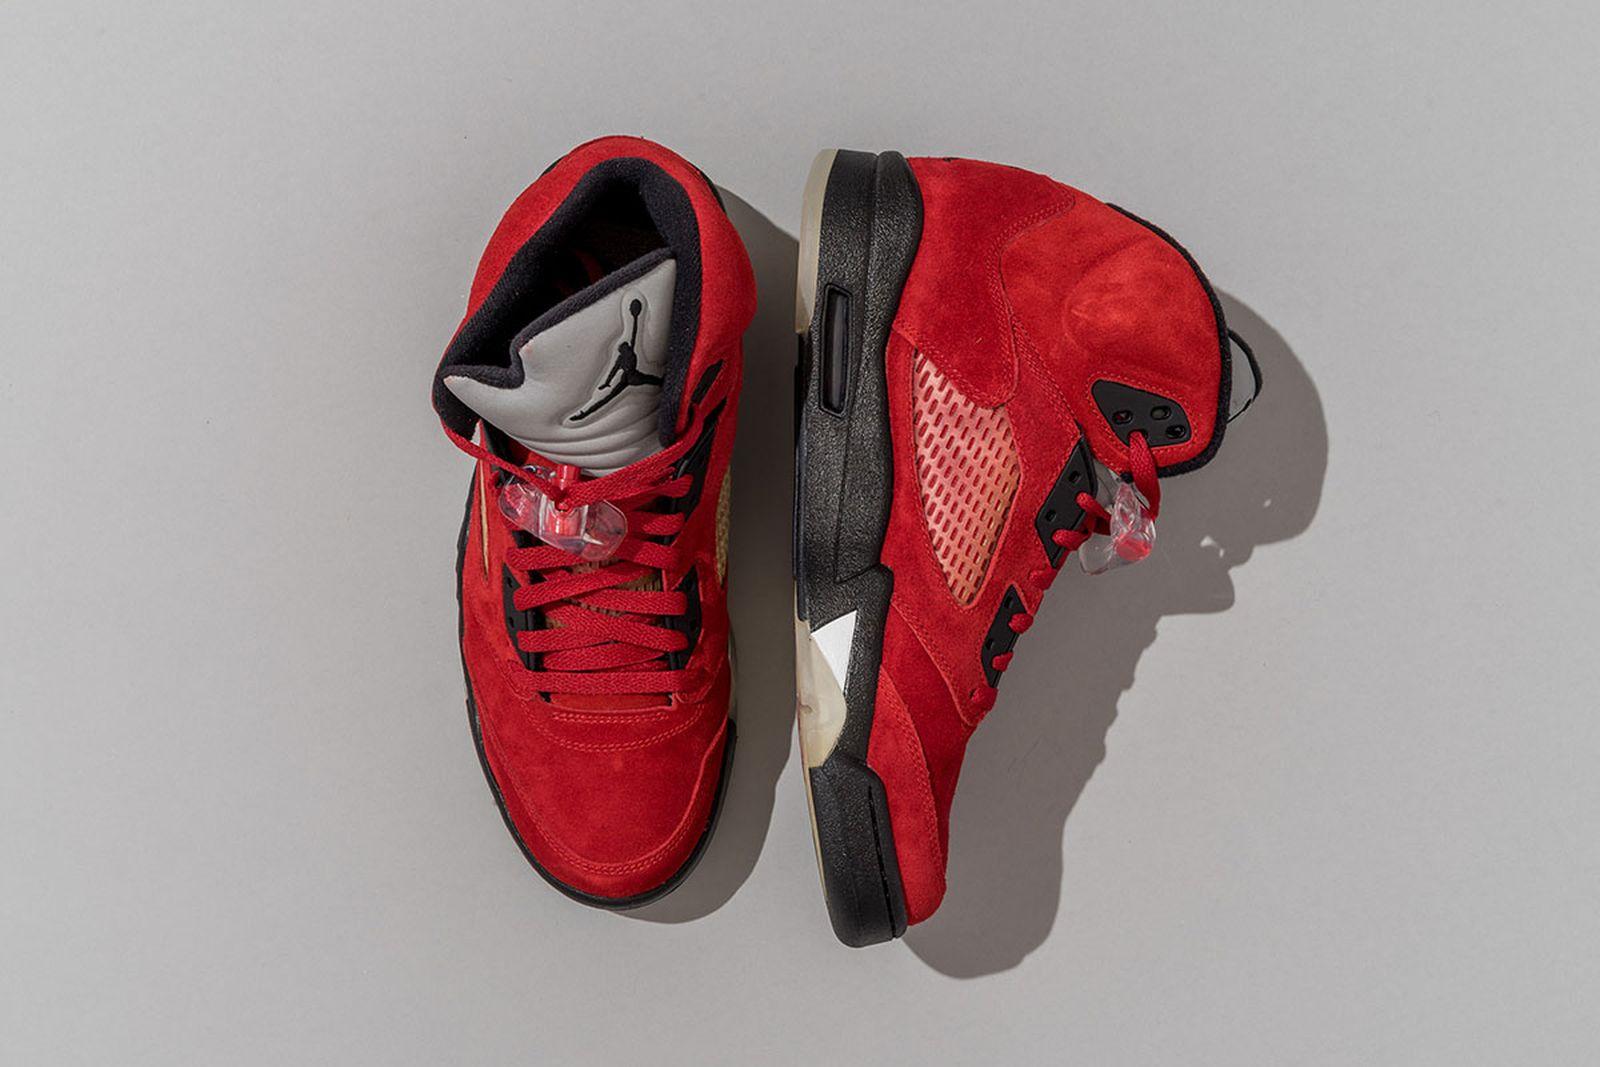 2000 Air Jordan 5 White/Black-Fire Red